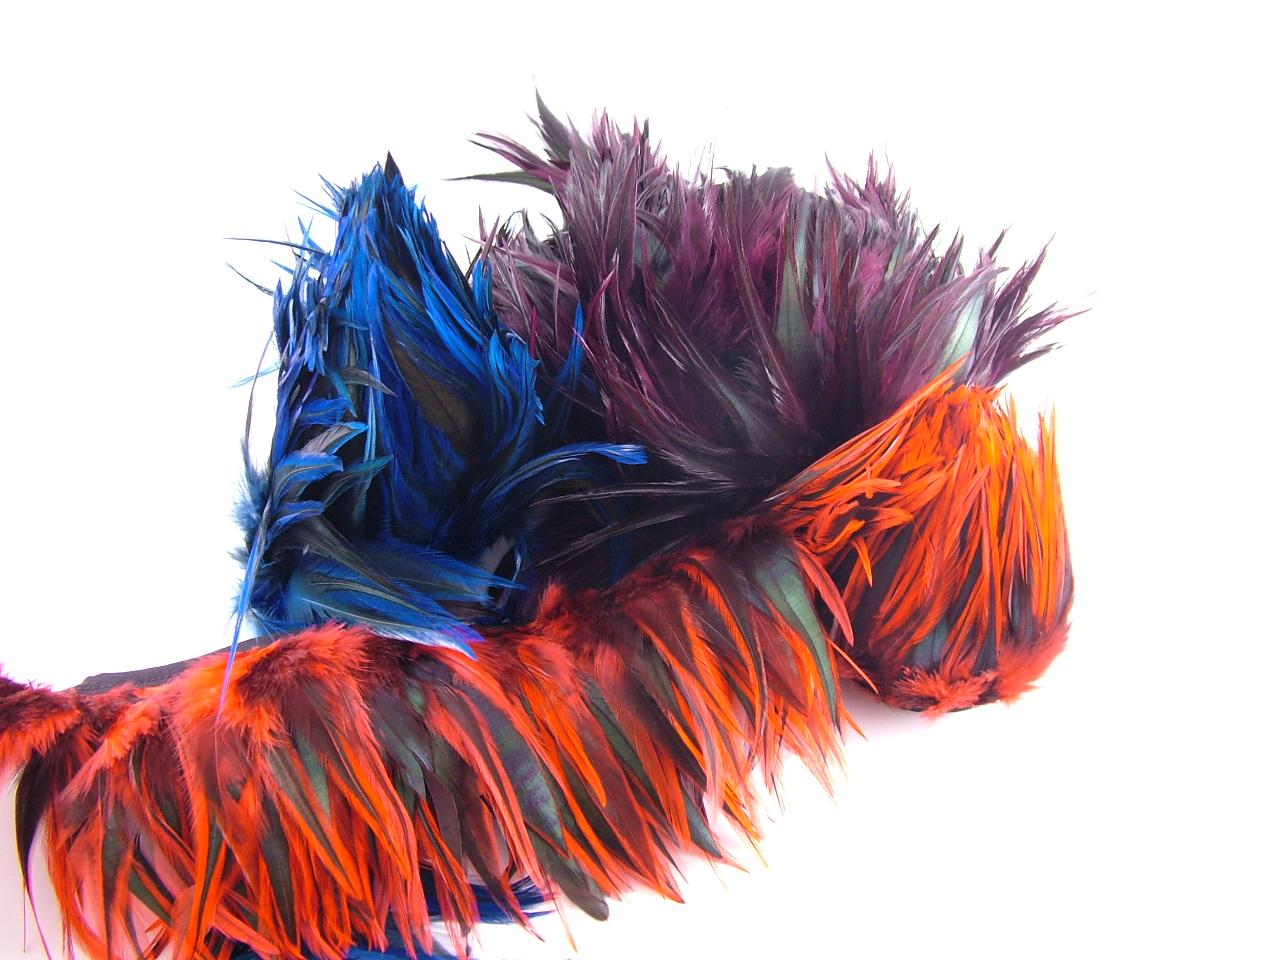 nudi-garls-badger-cock-hackle-feathers